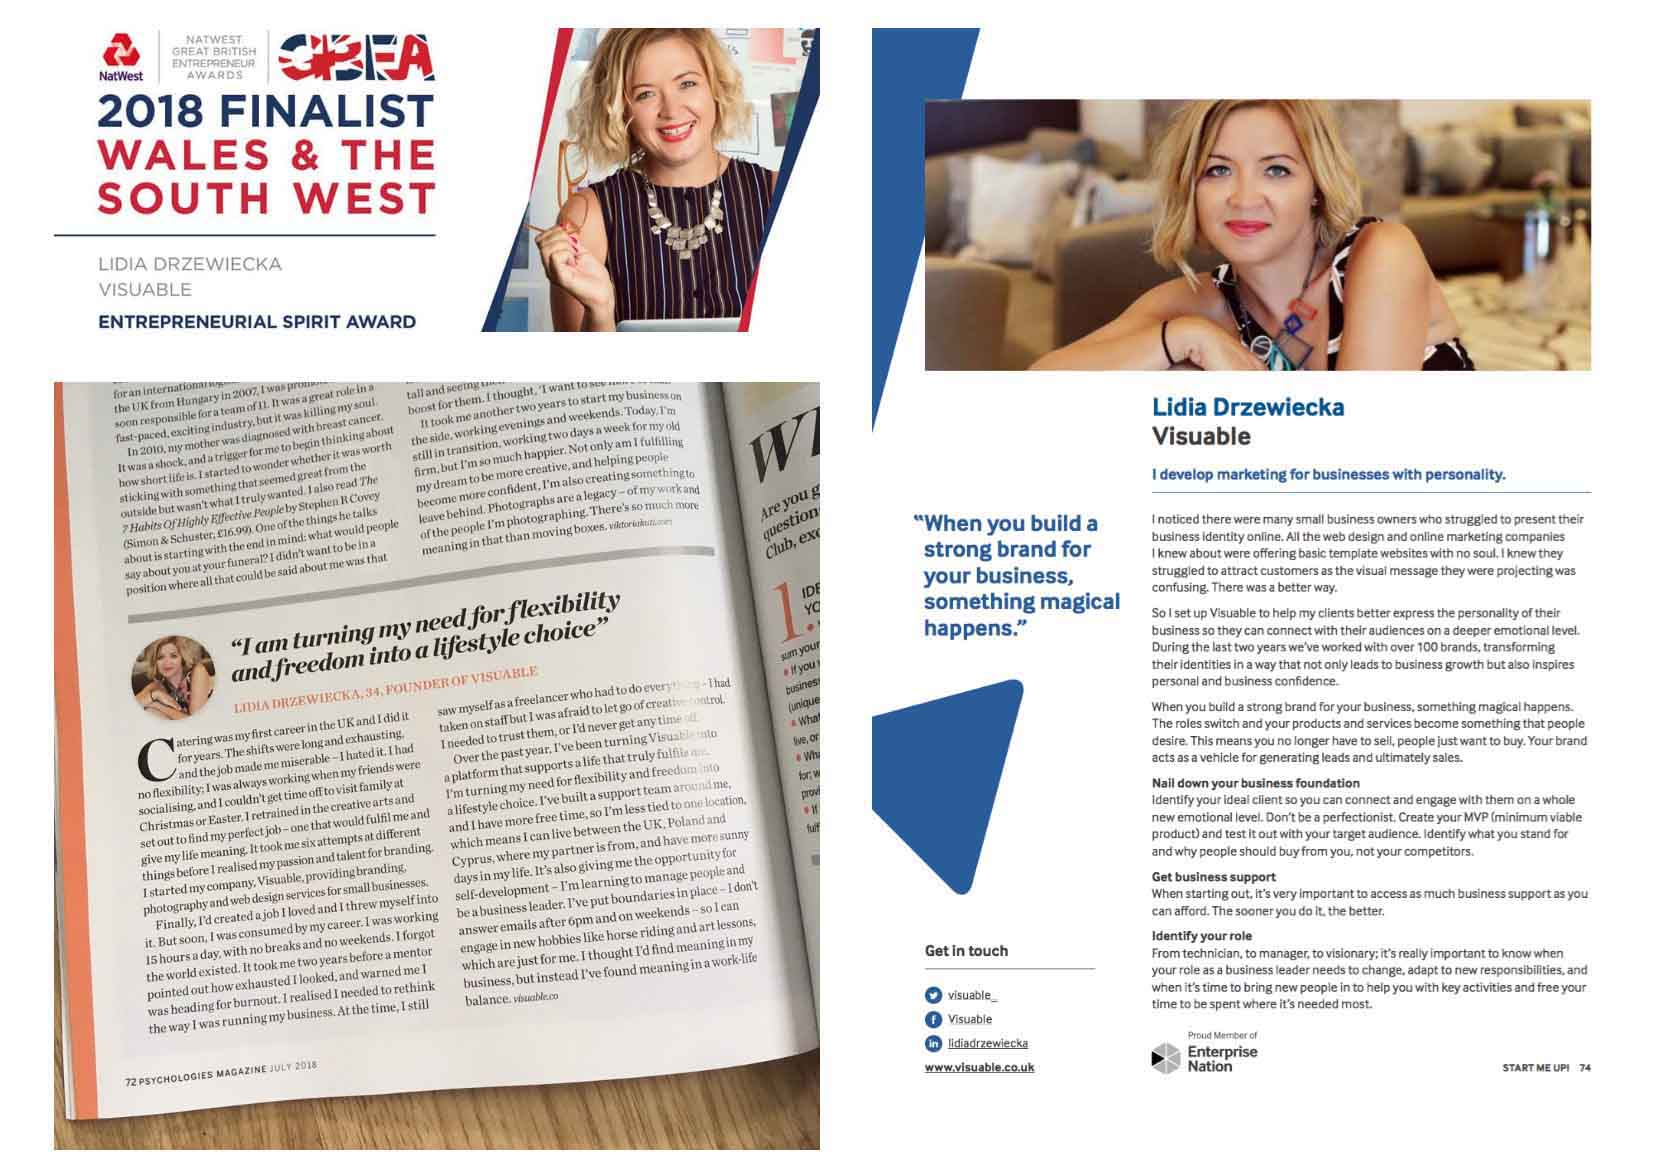 lidia-drzewiecka-personal-branding-expert-publications